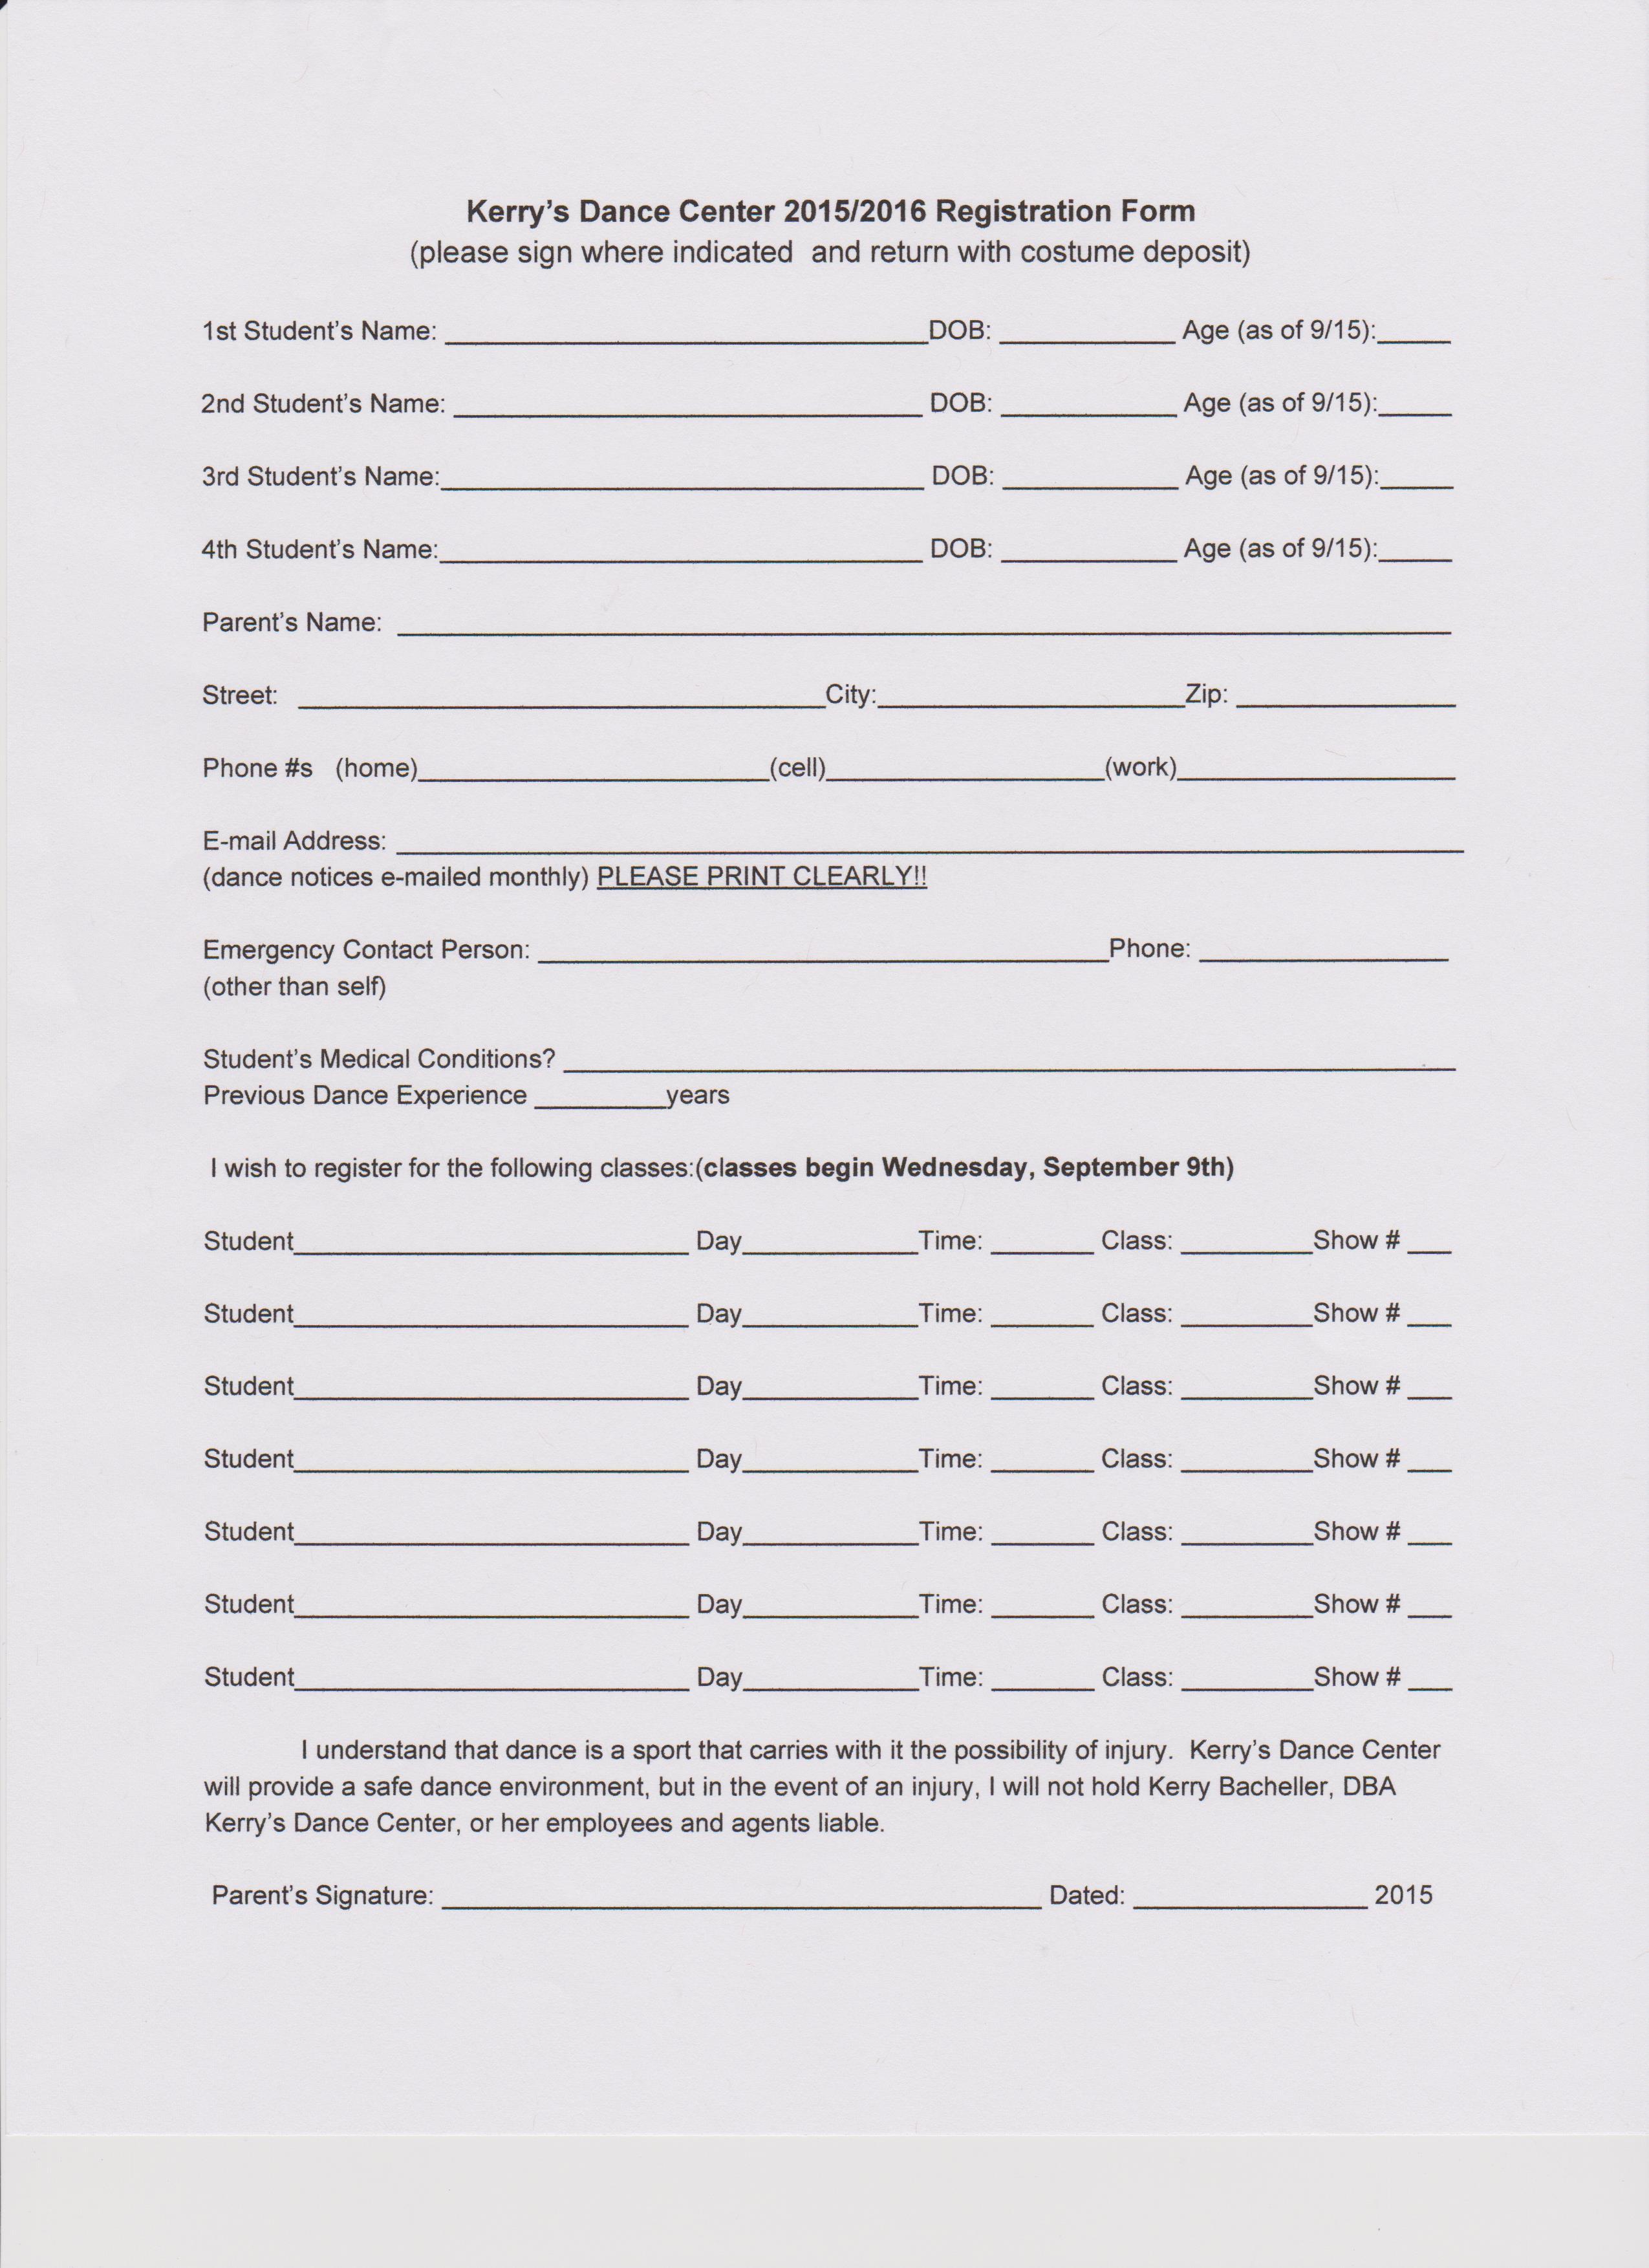 KDC registration p1 001